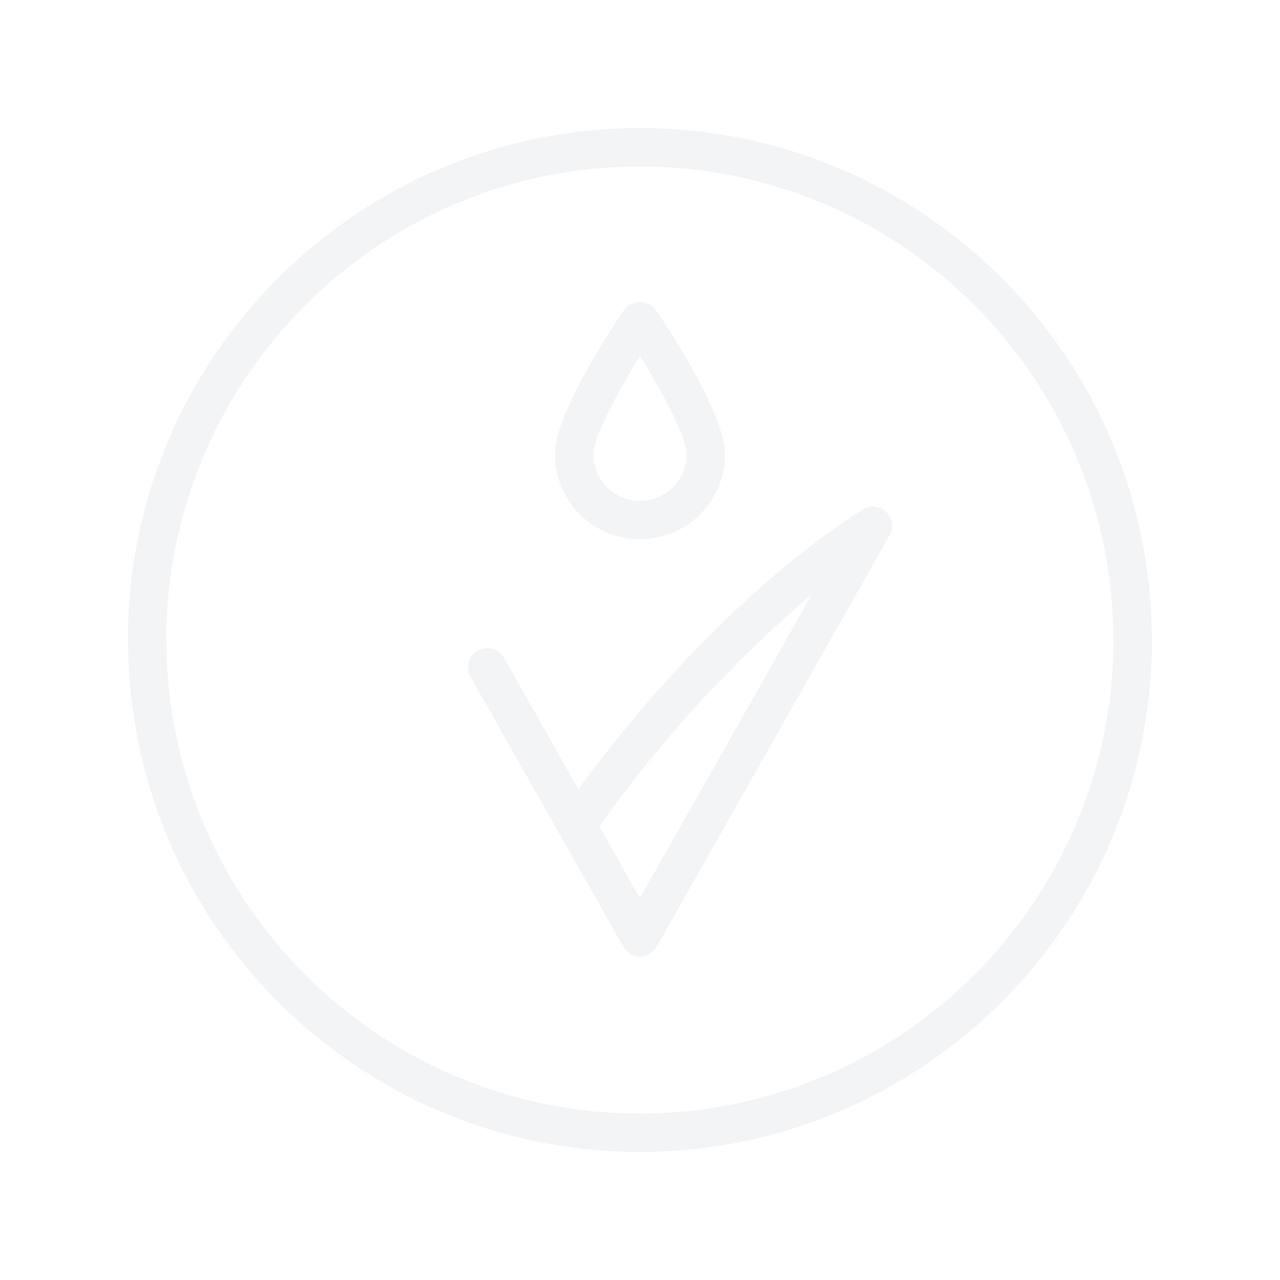 KOCOSTAR Tropical Coconut Eye Patch 60pcs